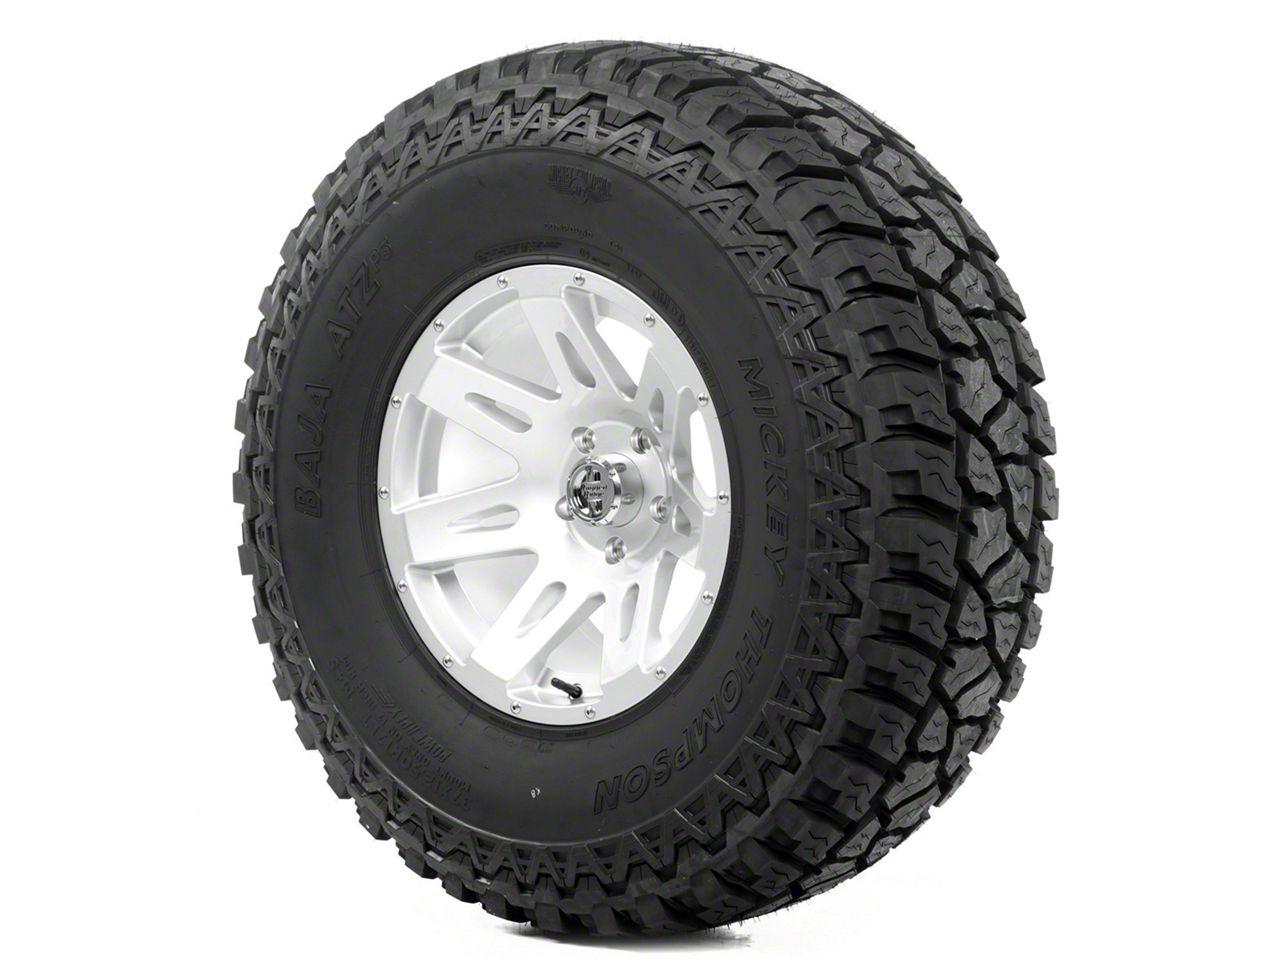 Rugged Ridge XHD Wheel 17x9 Silver and Mickey Thompson ATZ P3 37x12.50x17 Tire Kit (07-18 Jeep Wrangler JK)